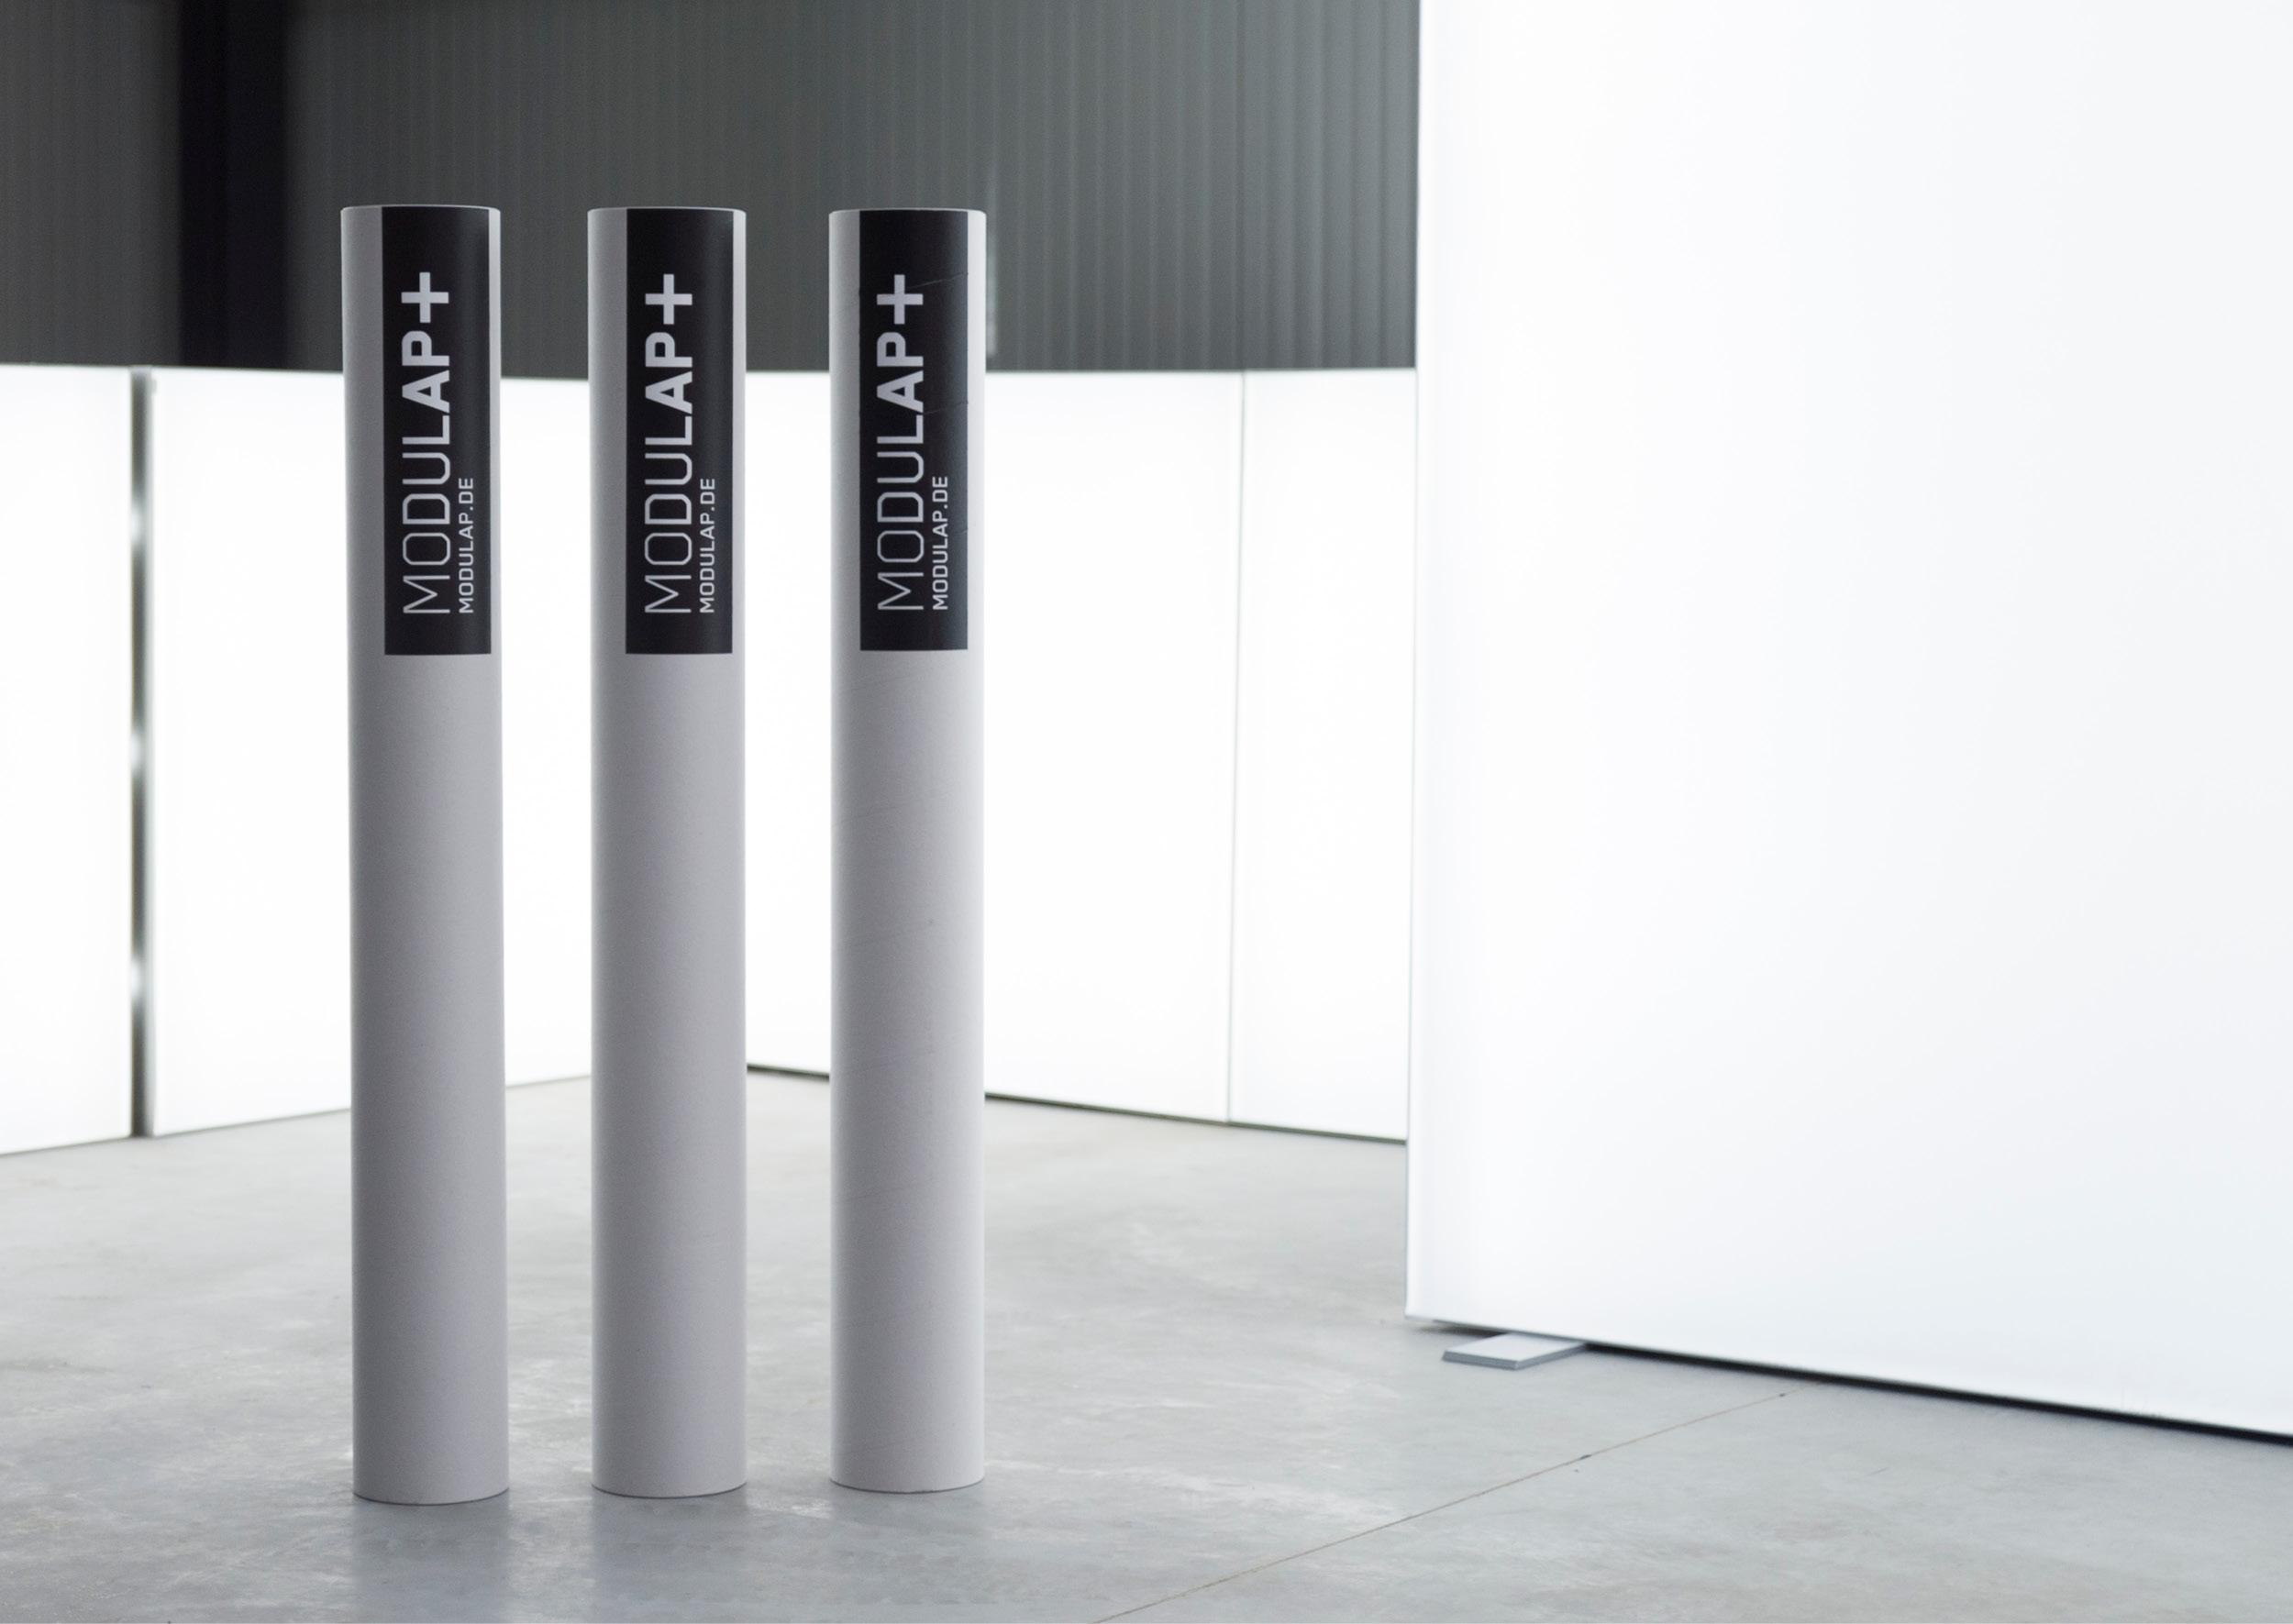 Nikolas-Wrobel-12x85-Modulap-Brand-Identity-Logo__7